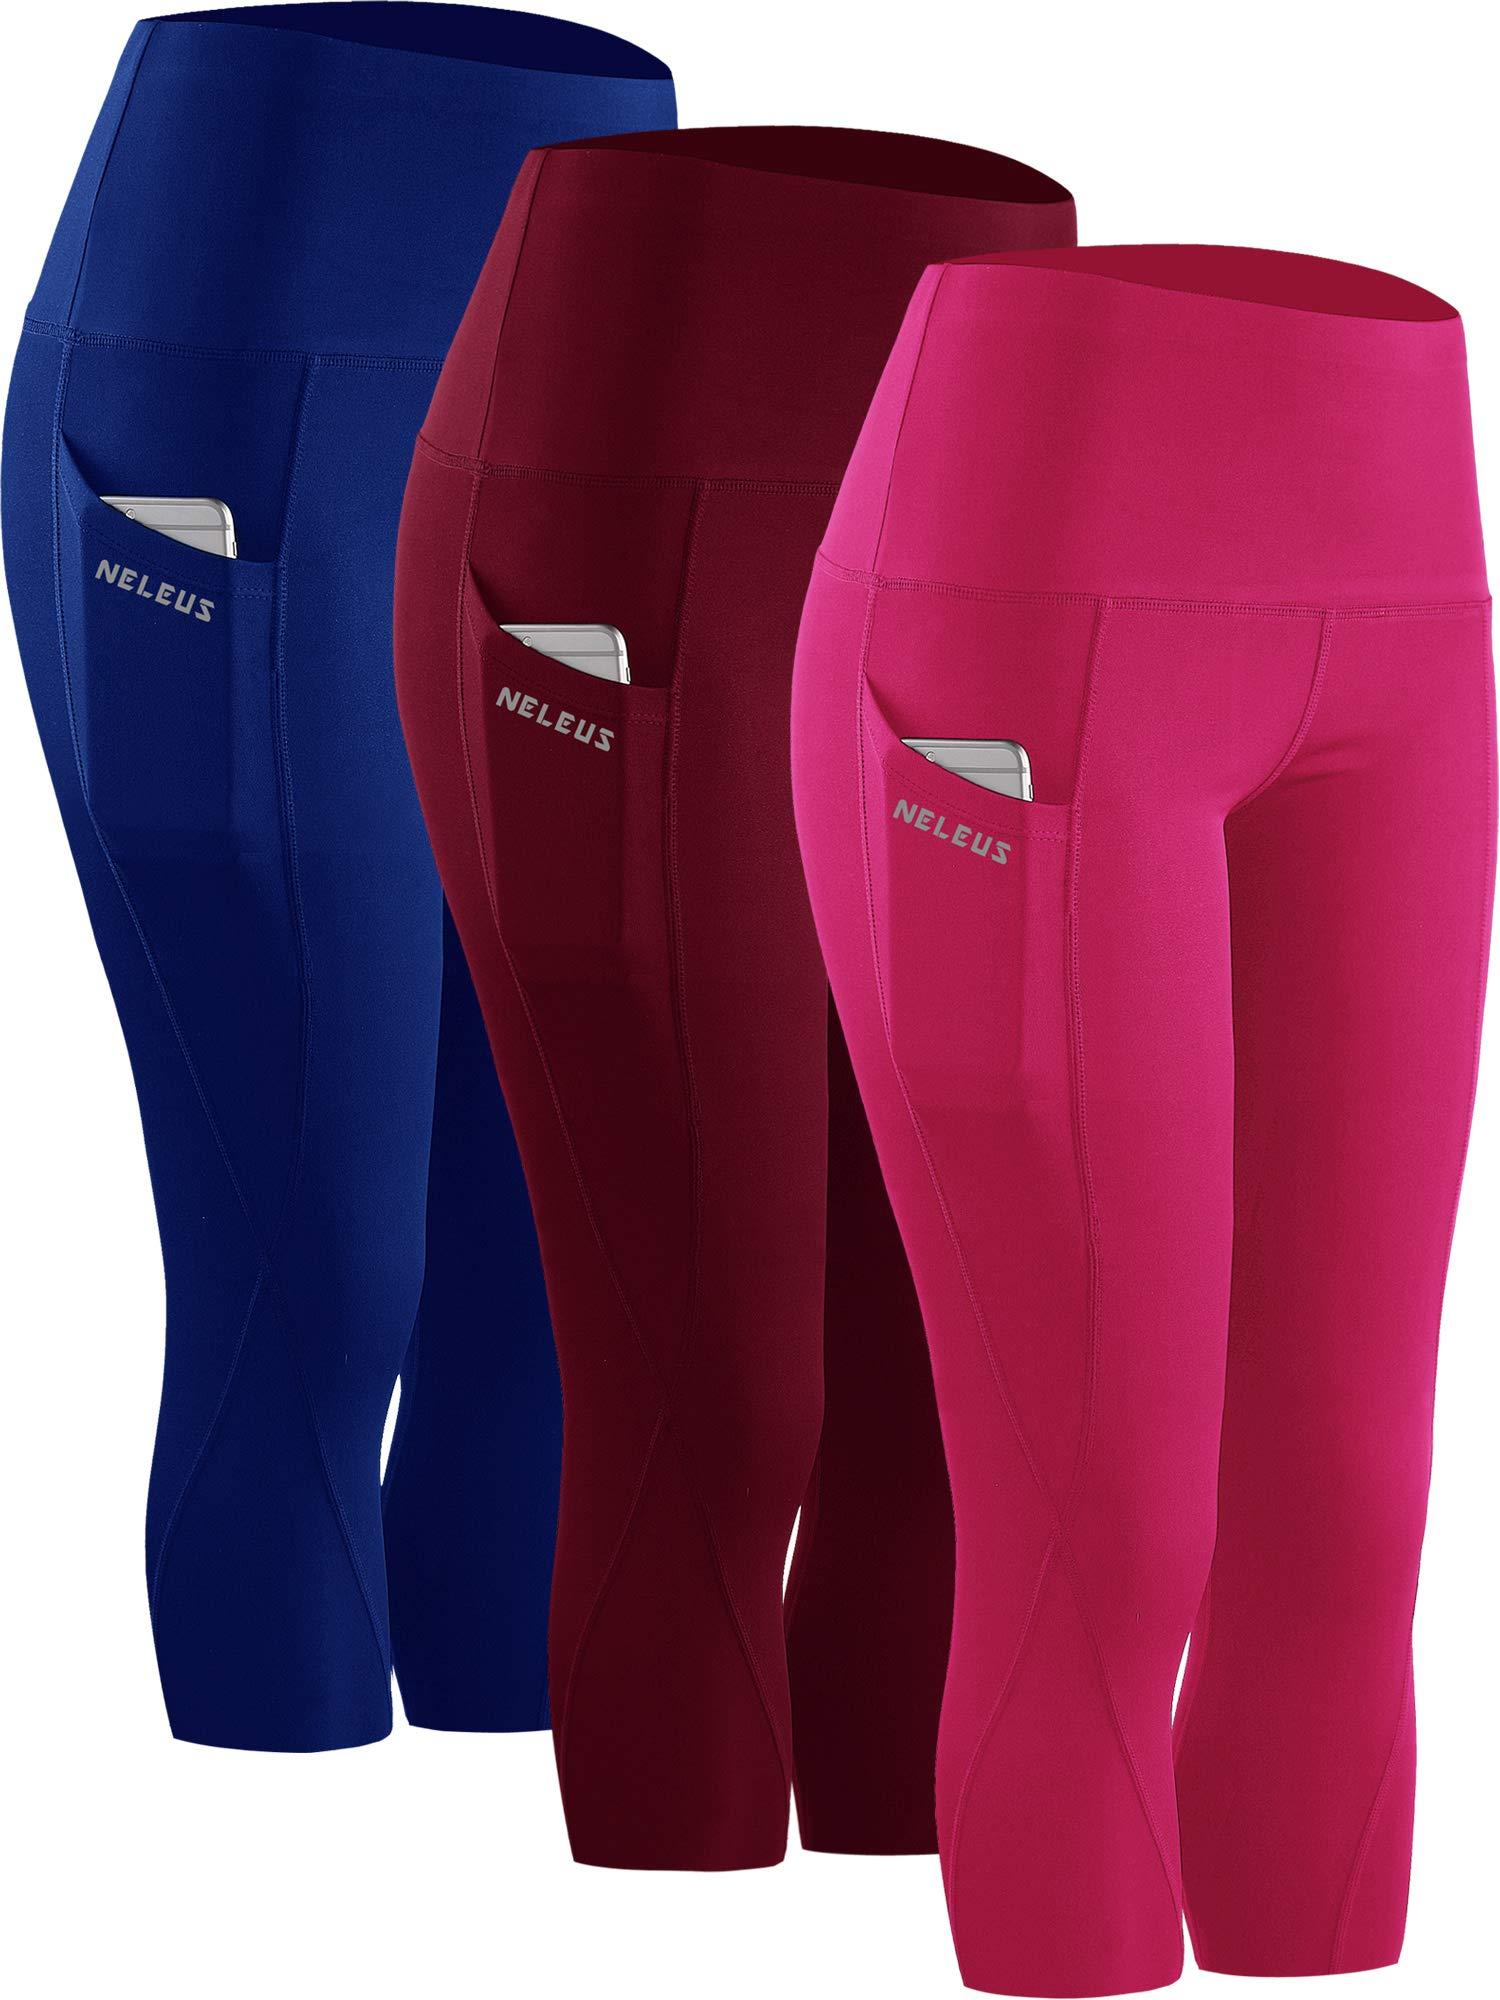 Neleus 3 Pack Workout Running Capris Tummy Control High Waist Yoga Leggings,9027,Dark red,Blue,Rose red,S,EU M